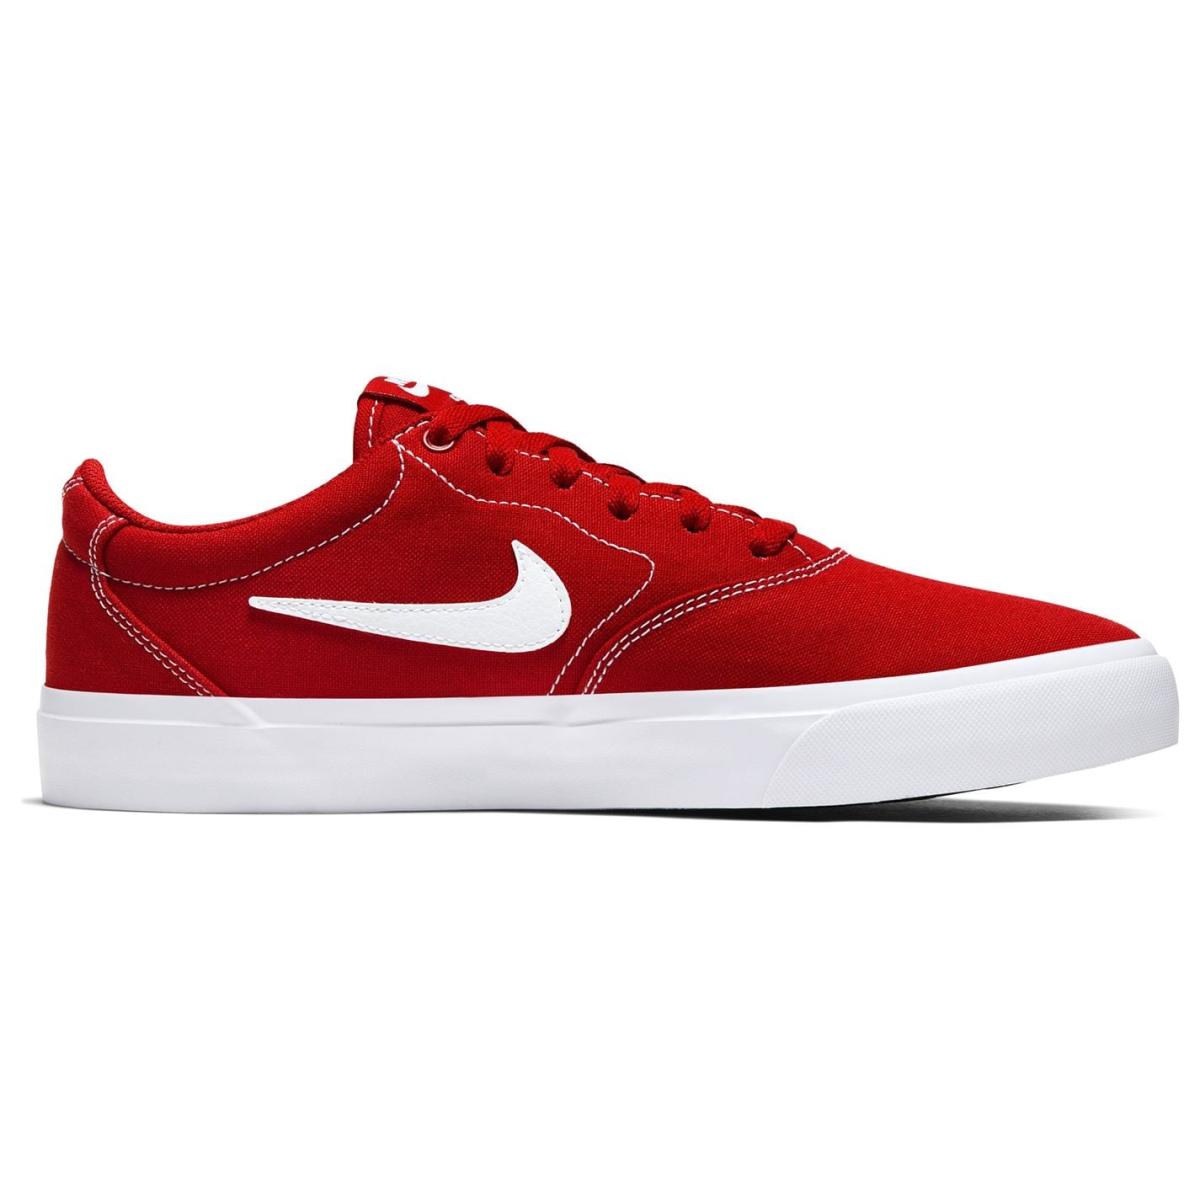 Nike-SB-Lot-Solarsoft-Skate-Chaussures-Messieurs-Skater-Chaussures-De-Sport-Skate-2162 miniature 54